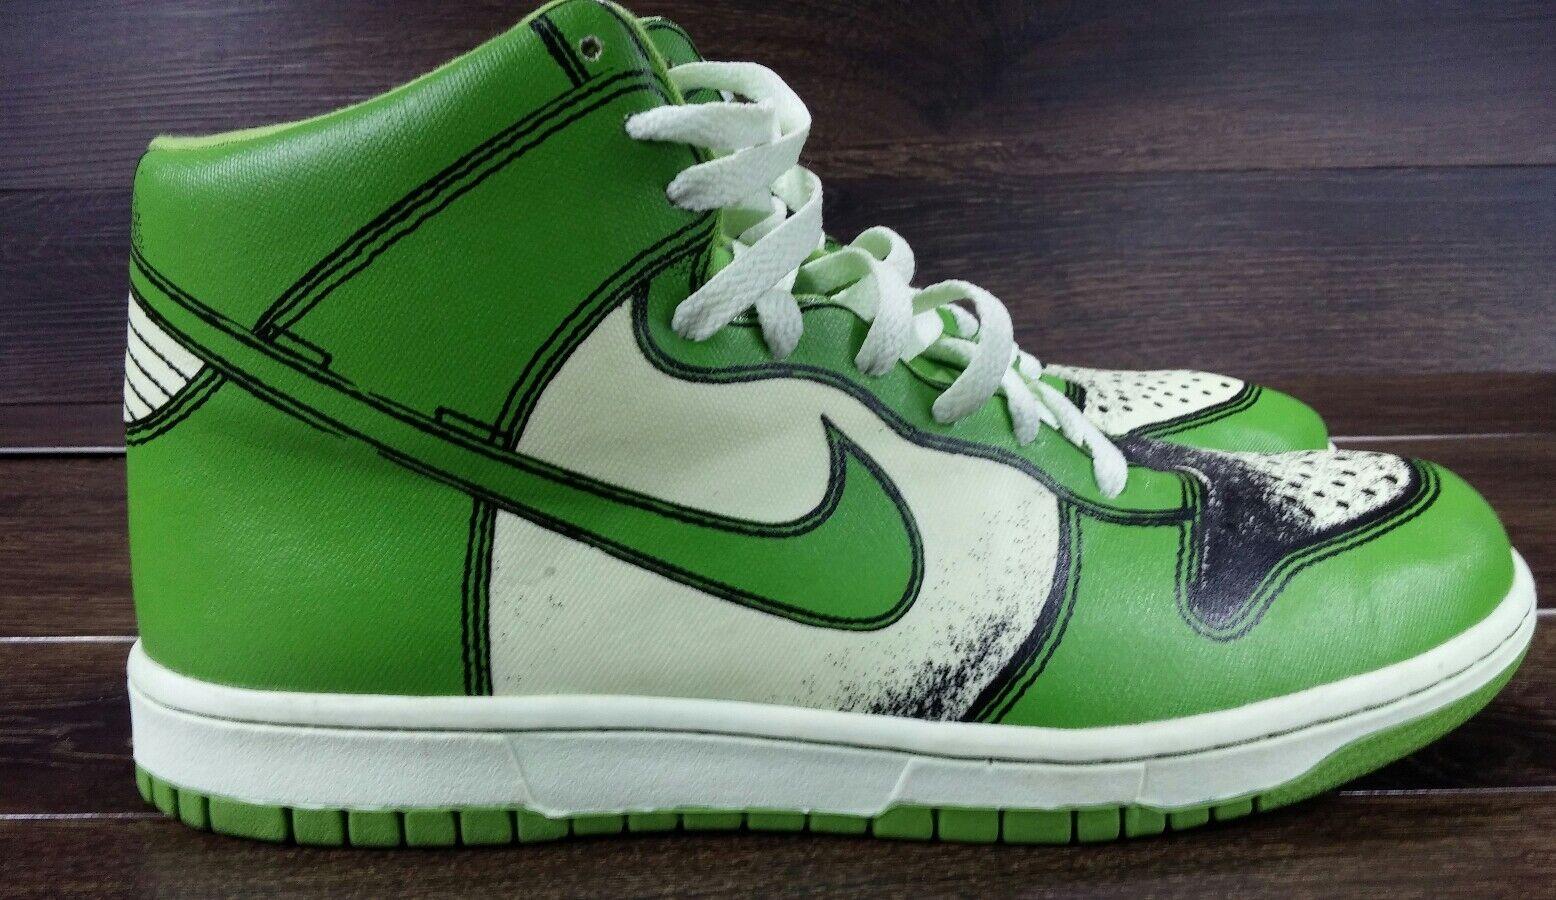 Nike Nike Nike Dunk High SB 1 Piece Premium 13 Seafoam Chlgoldphyll 318998 031 Paris London d55739